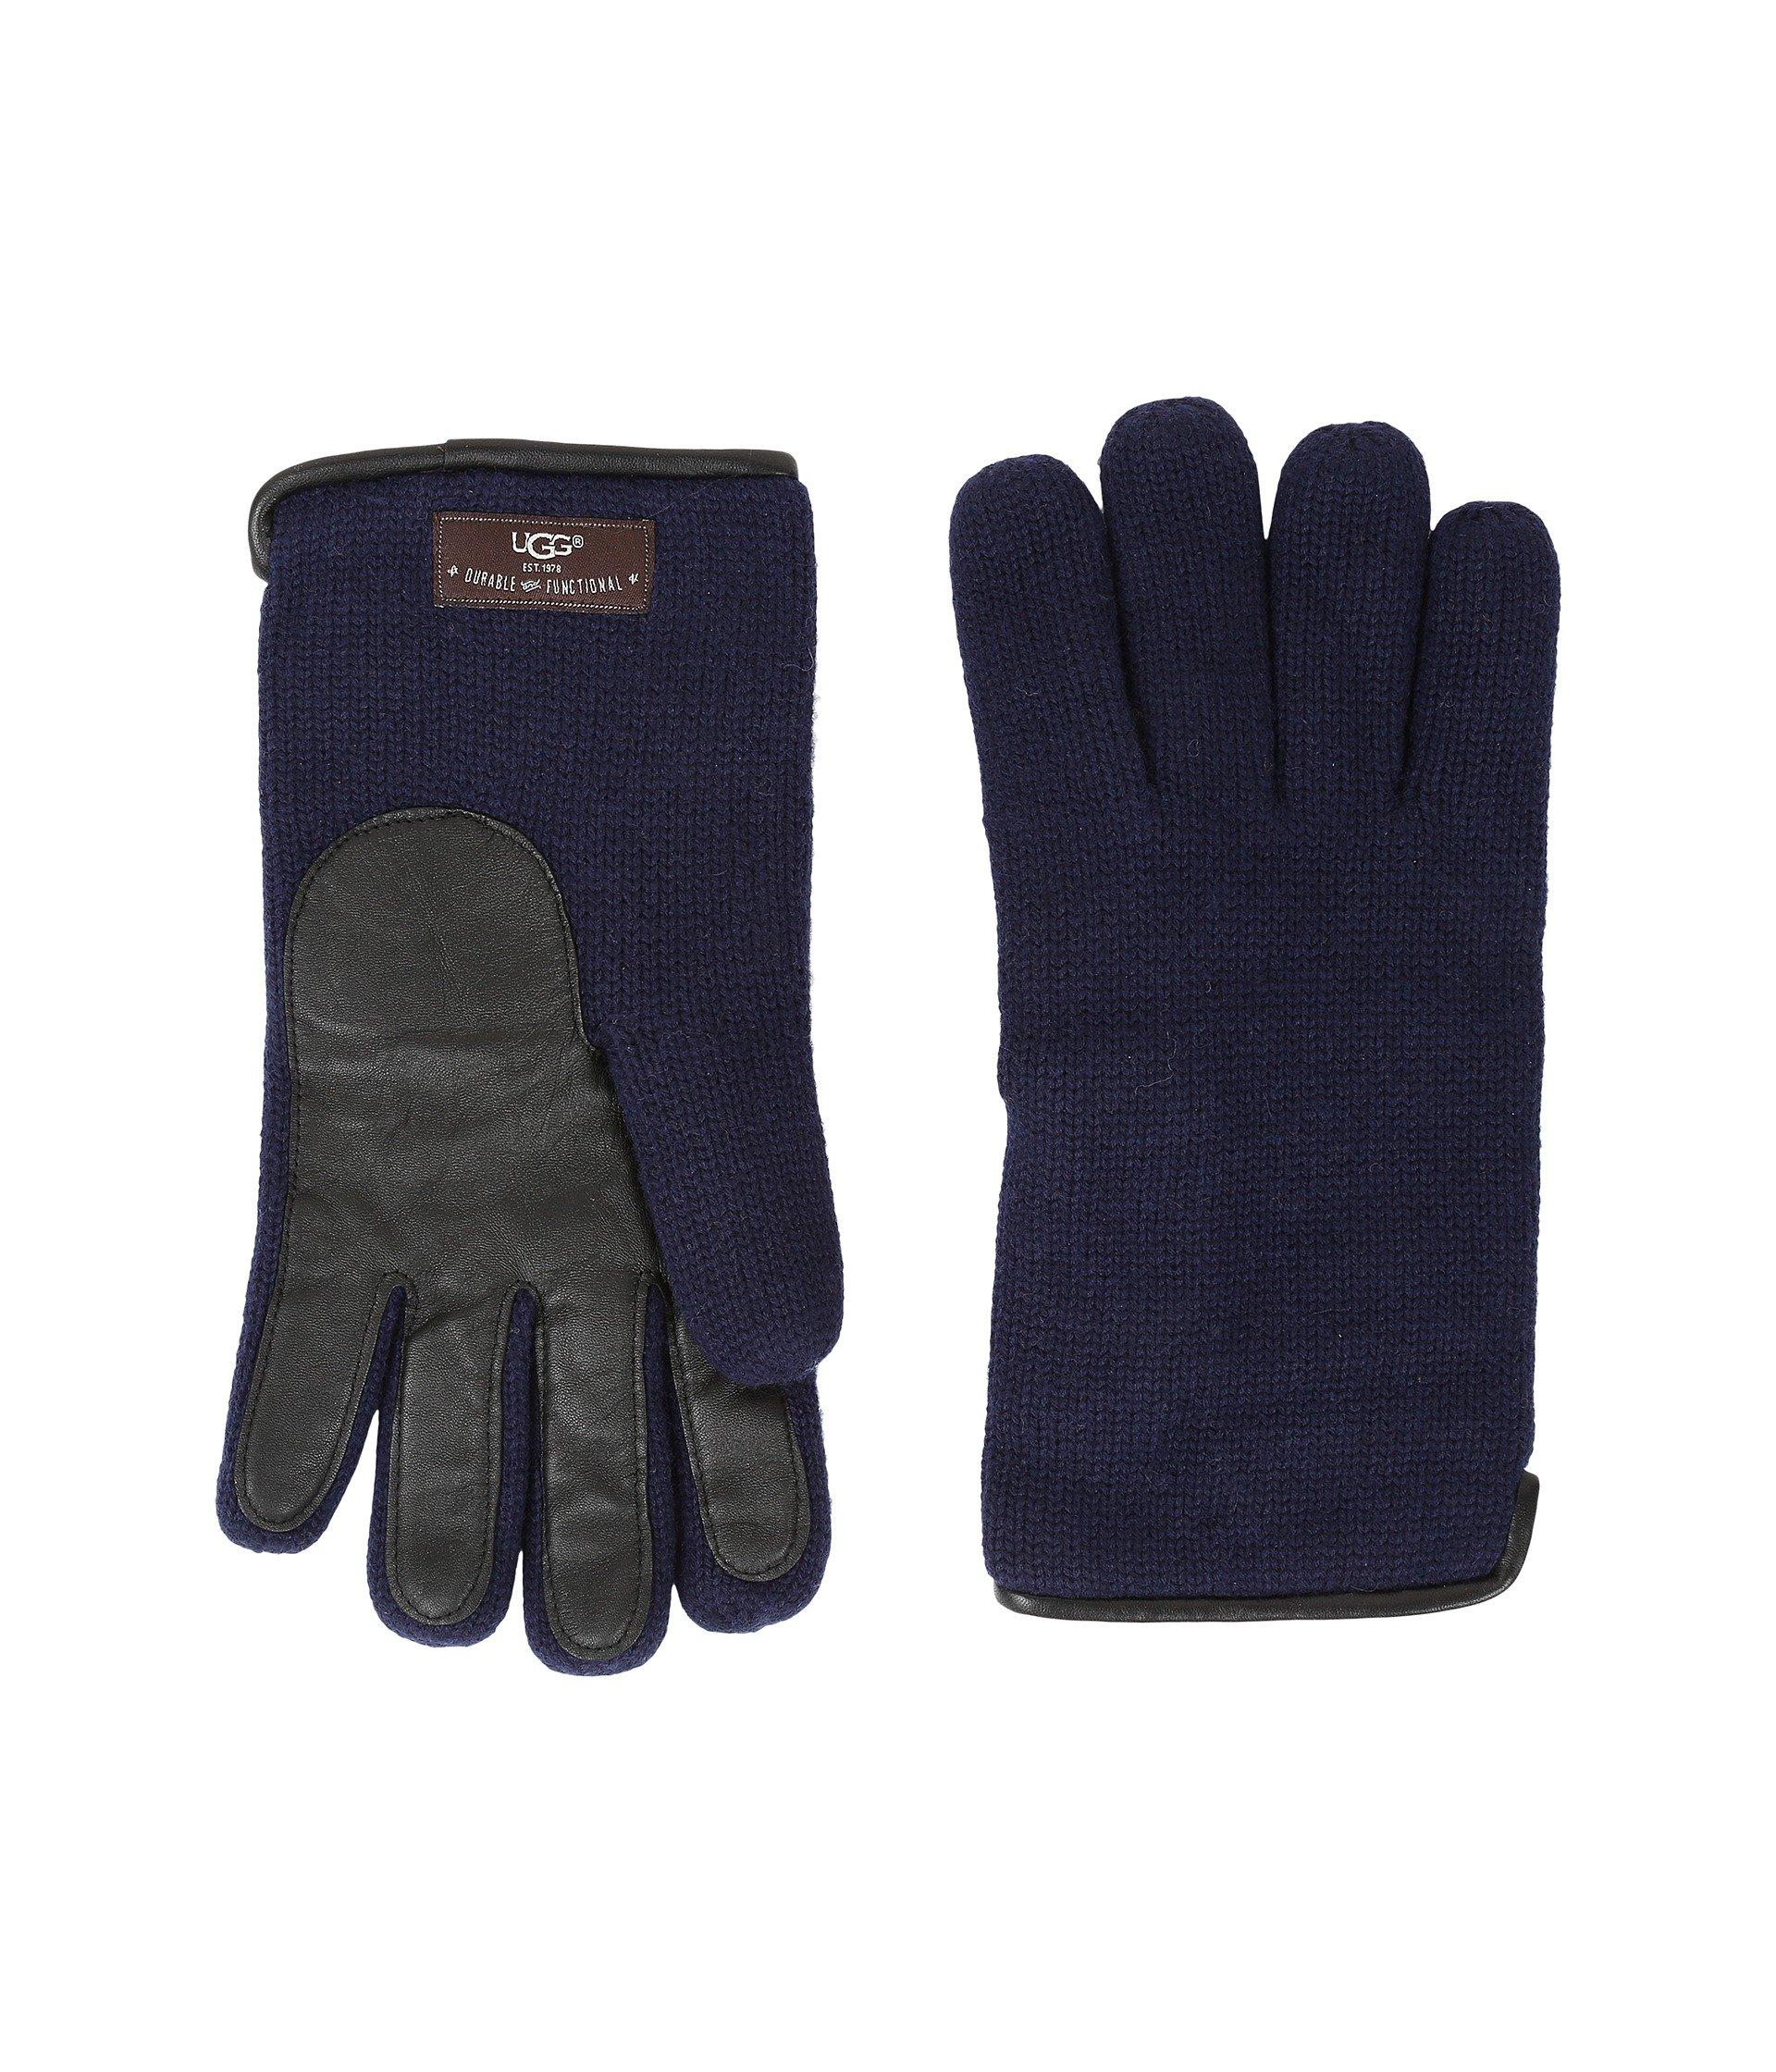 Guantes para Hombre UGG Knit Tech Solid Gloves  + UGG en VeoyCompro.net